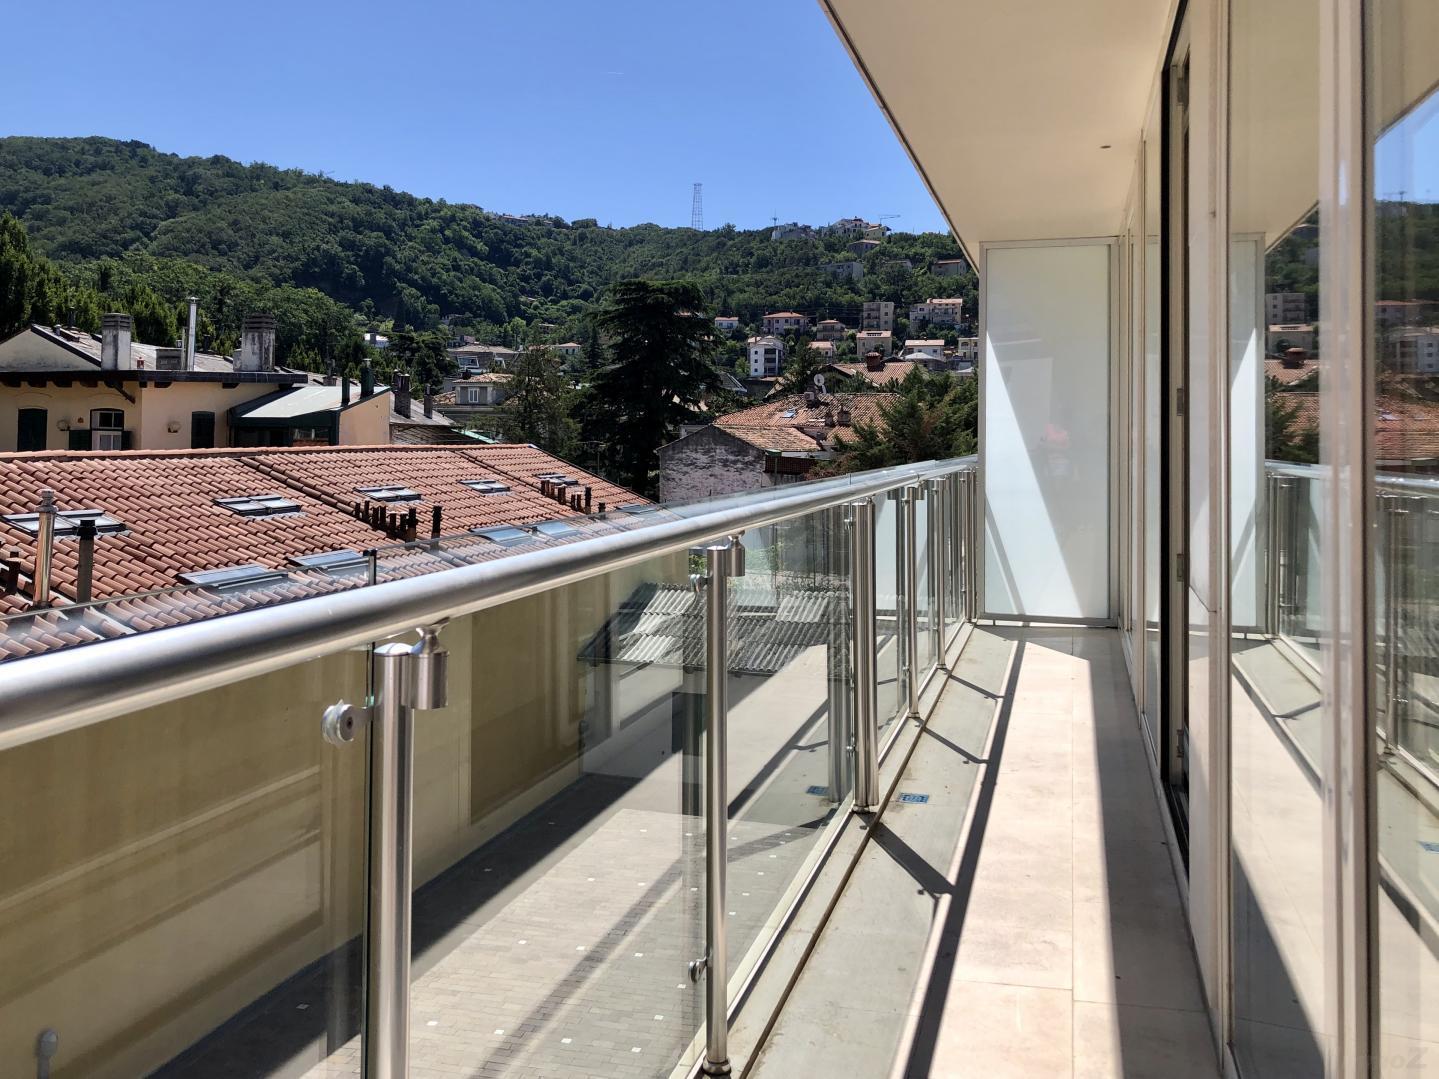 Apartments Barcola (39)